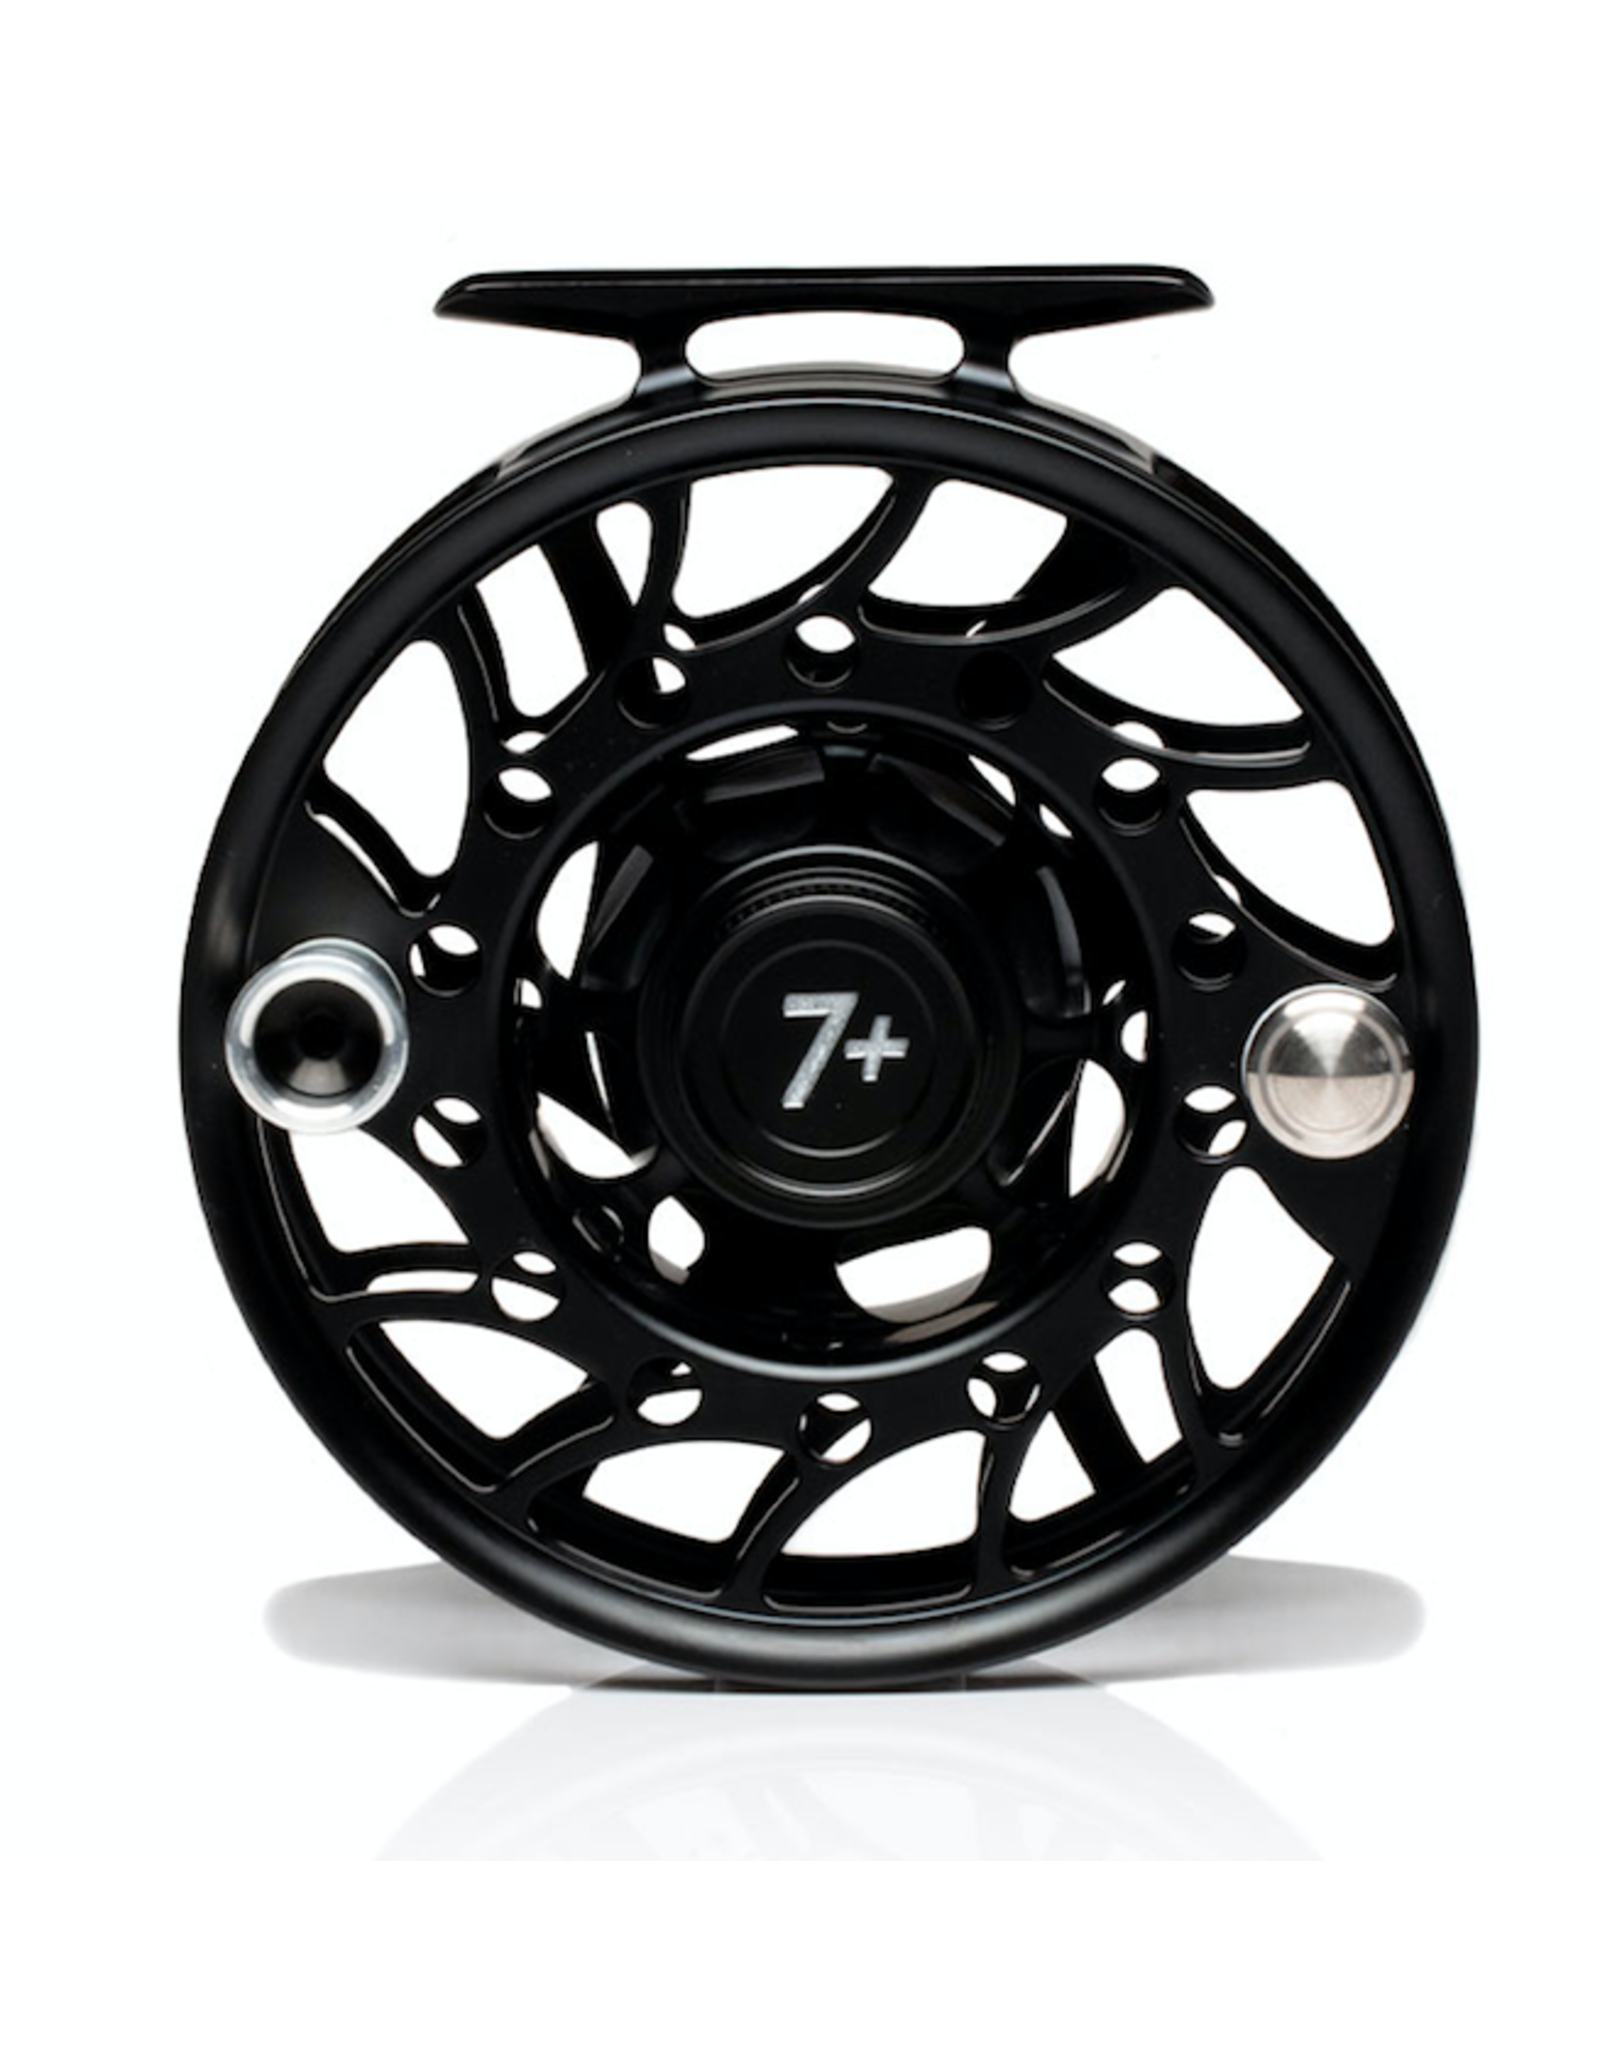 Hatch HATCH Iconic 7 Plus Reel (Black/ Silver) Mid Arbor